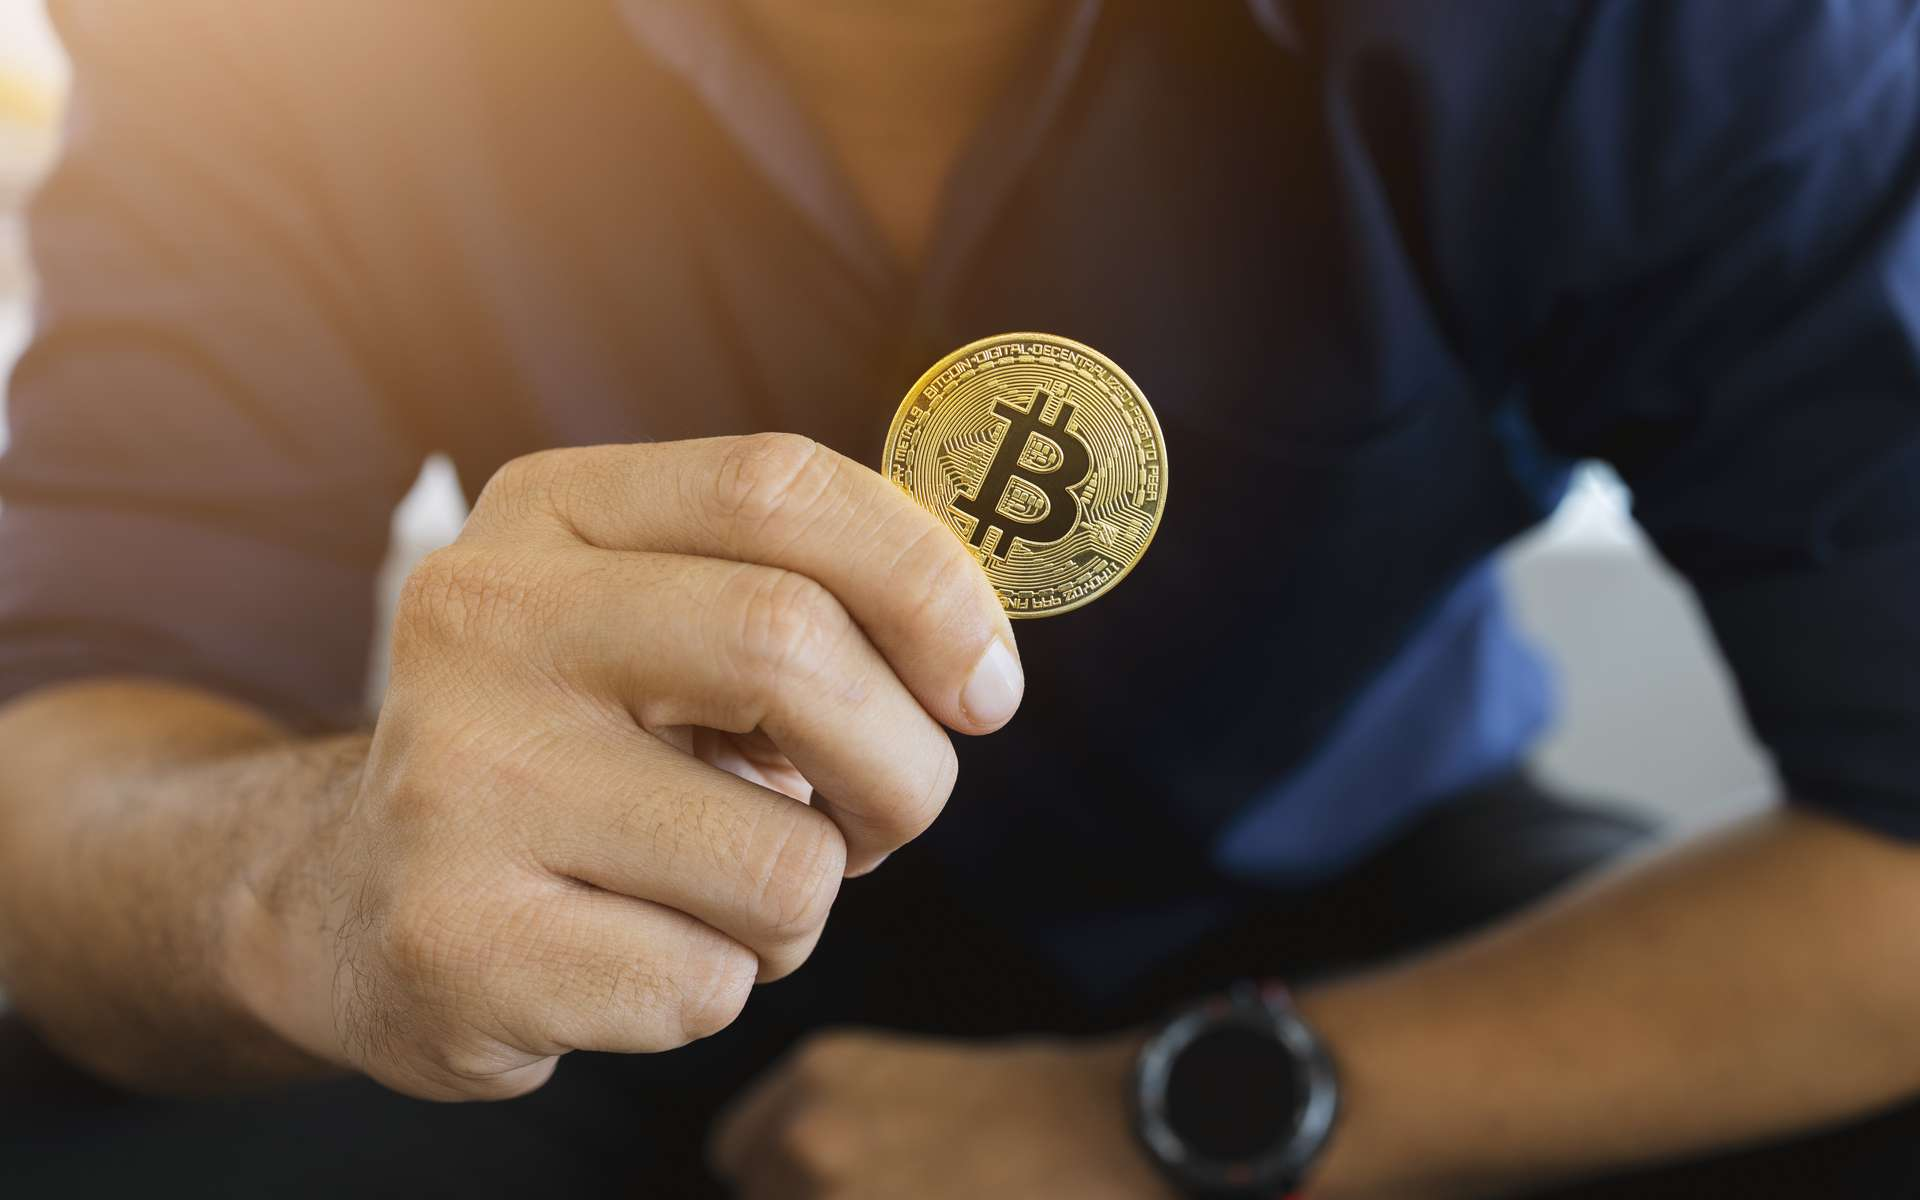 Bitcoin (BTC) est-il anonyme ? © memorystockphoto